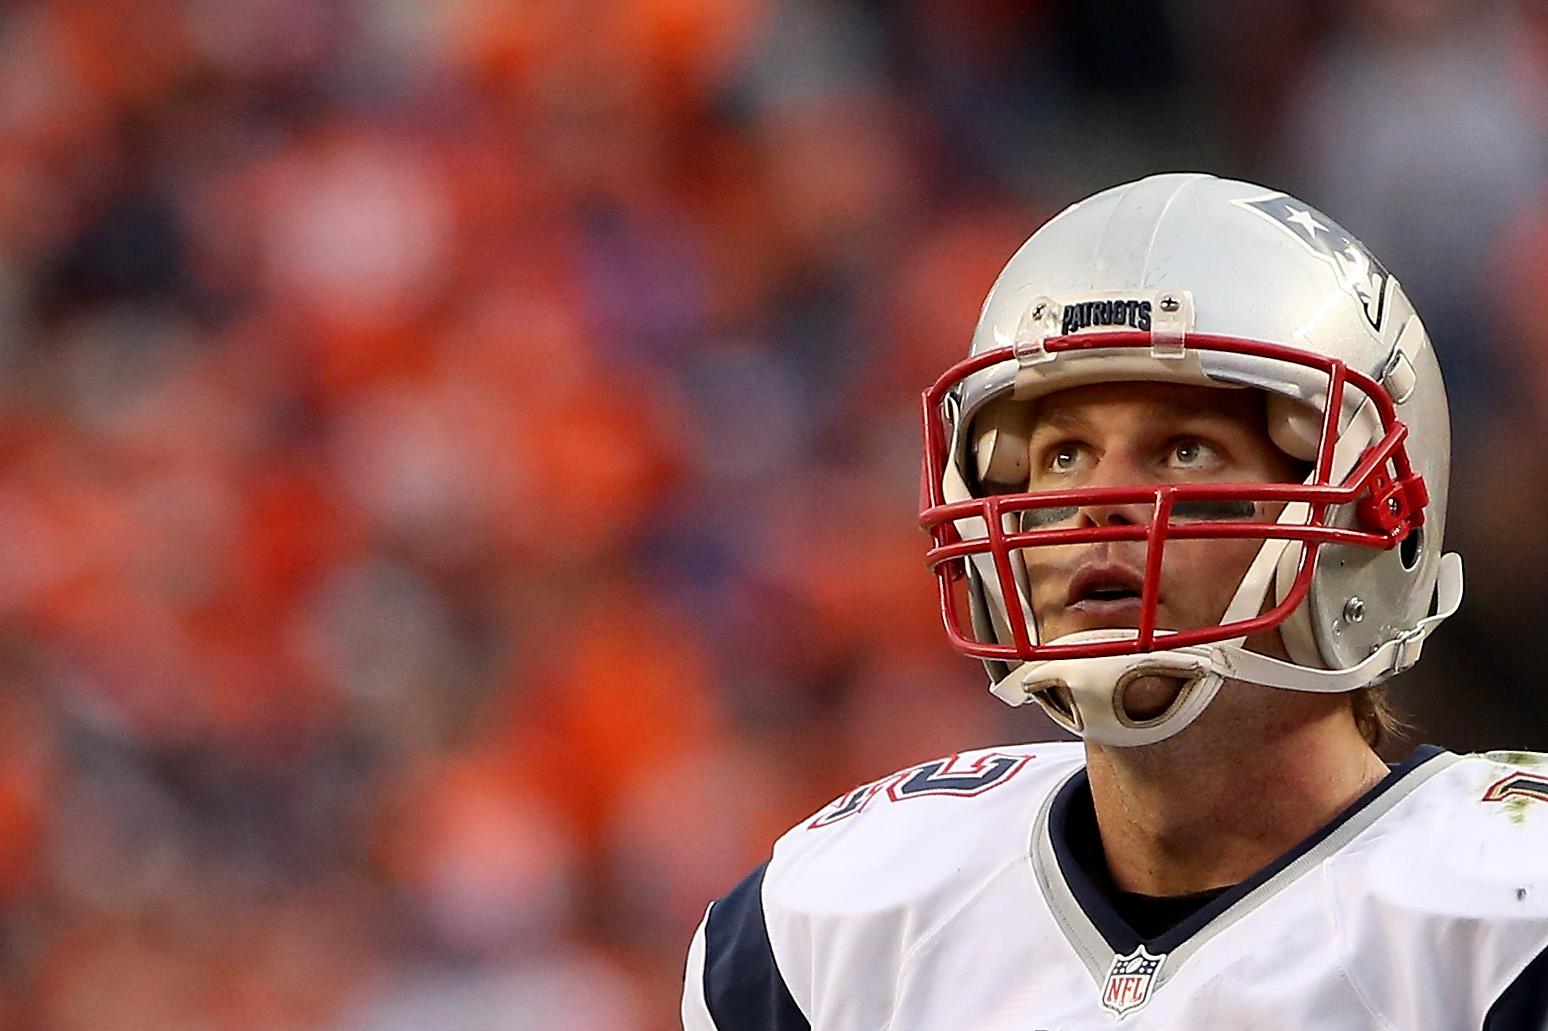 Julian Edelman: Patriots WR Forgot to Return a Blockbuster Game 12 Years Ago